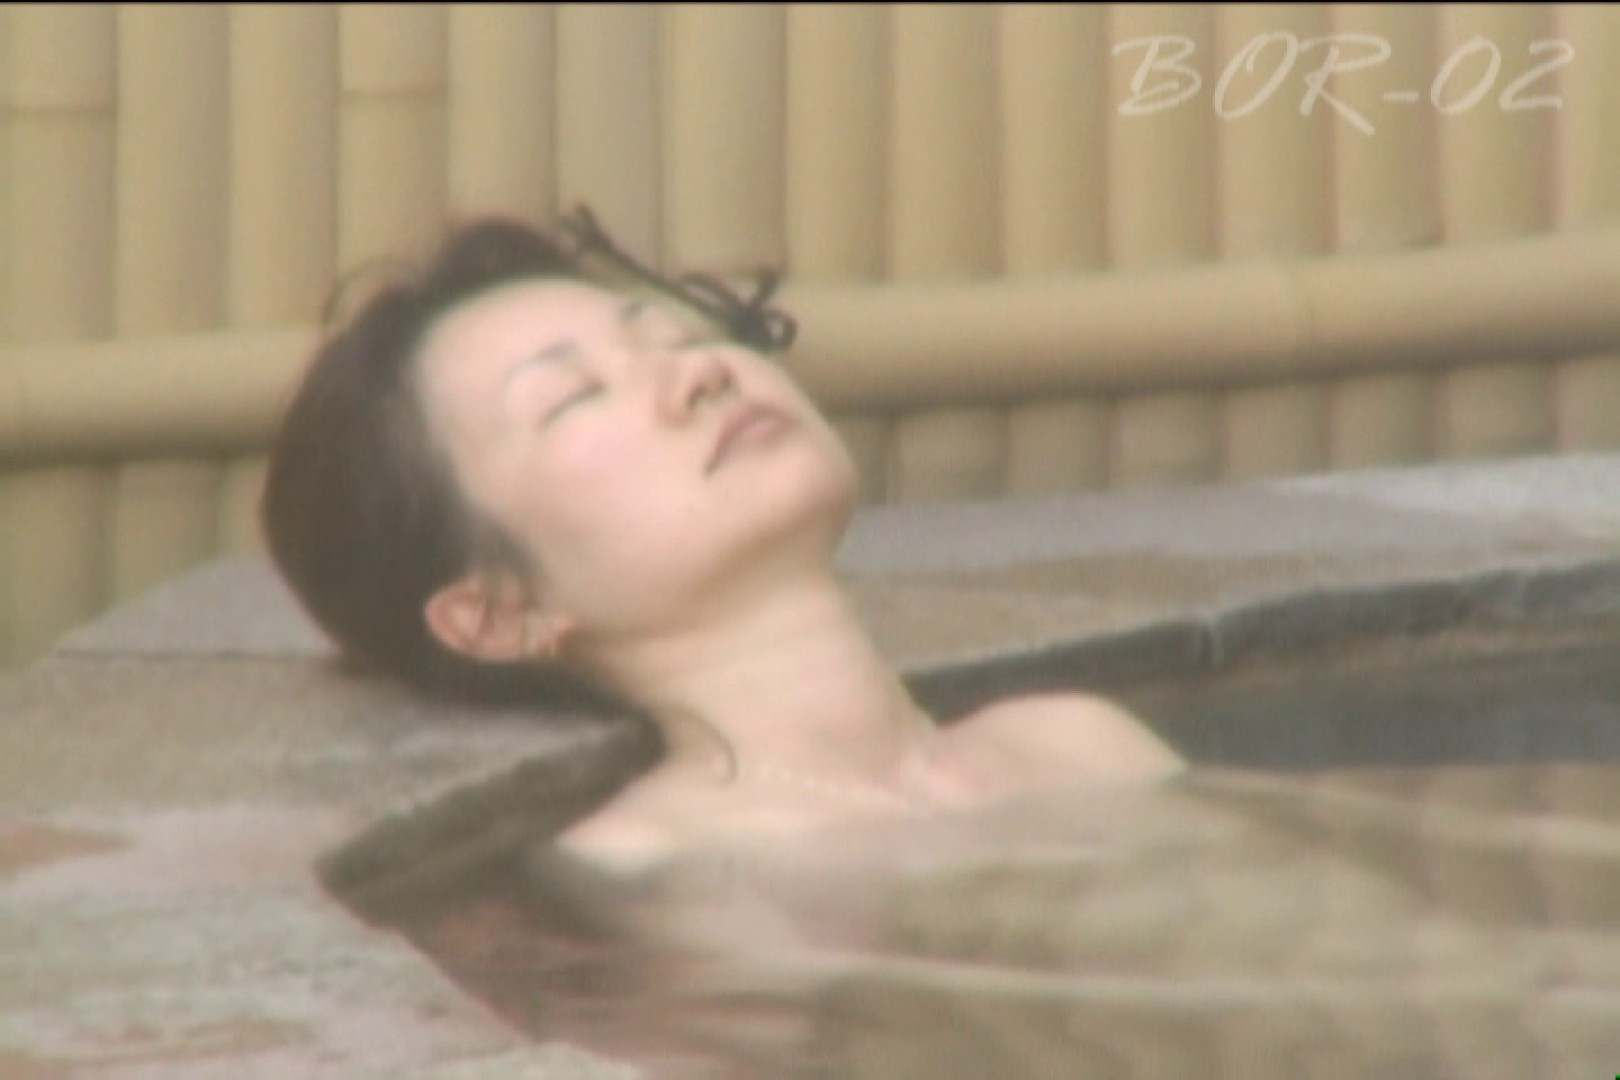 Aquaな露天風呂Vol.477 0  28連発 18